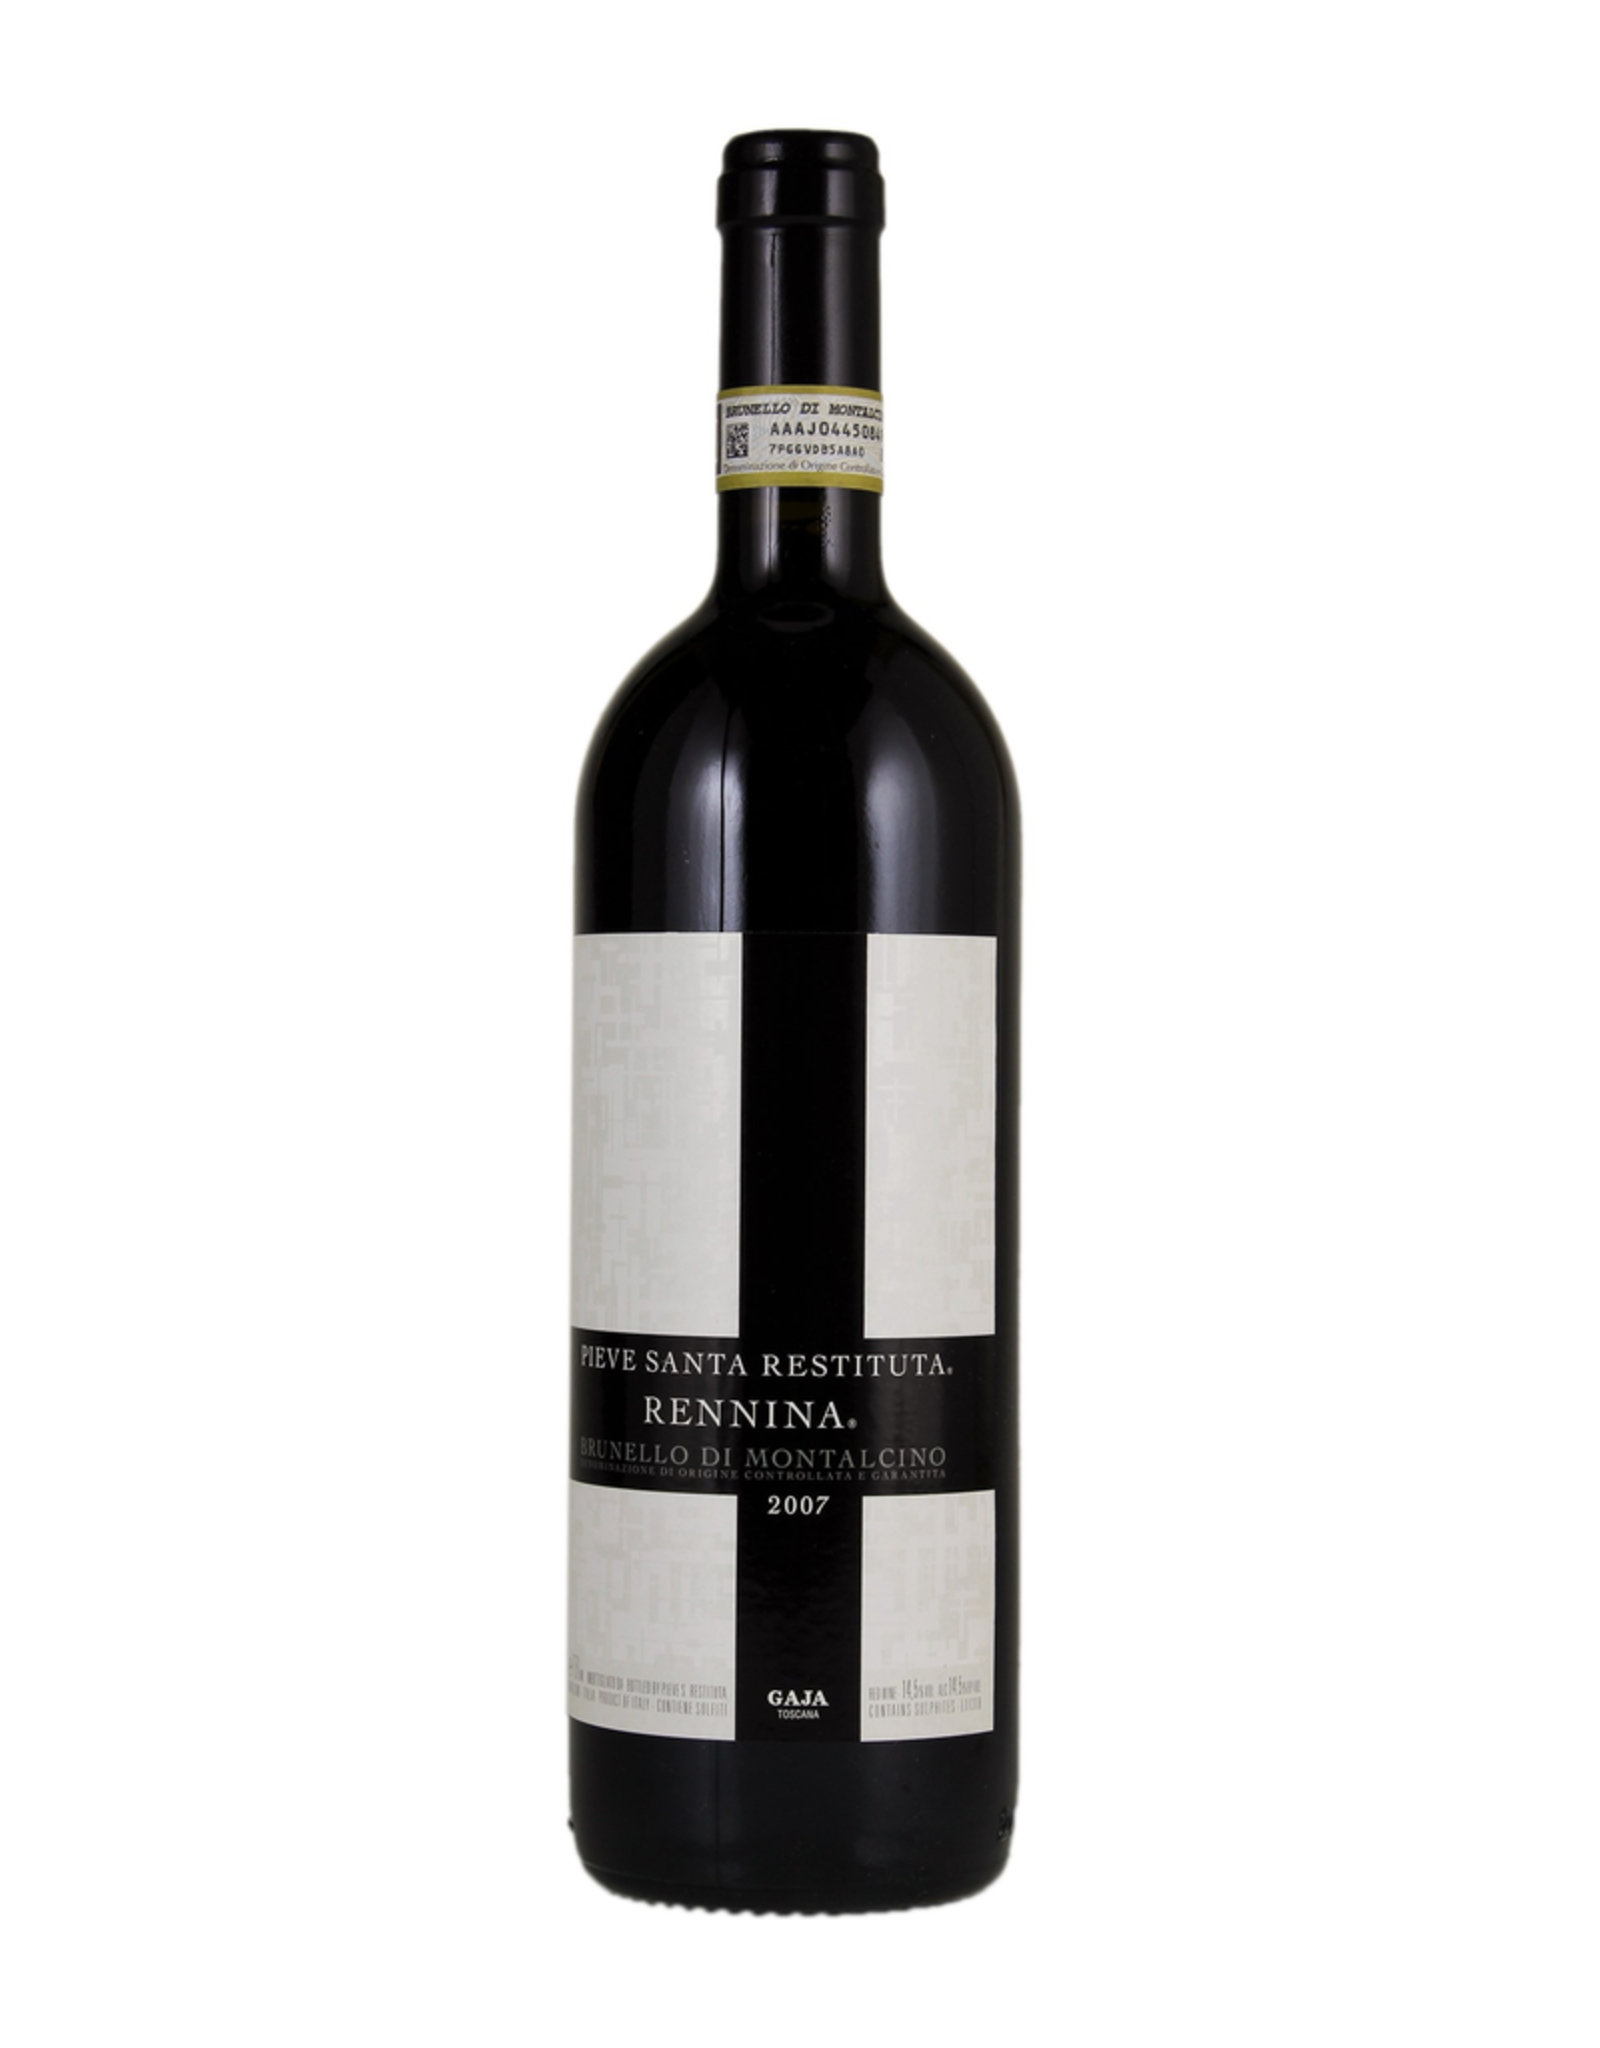 Red Wine 2007, Pieve Santa Restituta Rennina by Gaja, Sangiovese, Montalcino, Tuscany, Italy, 14% Alc, CT92.6